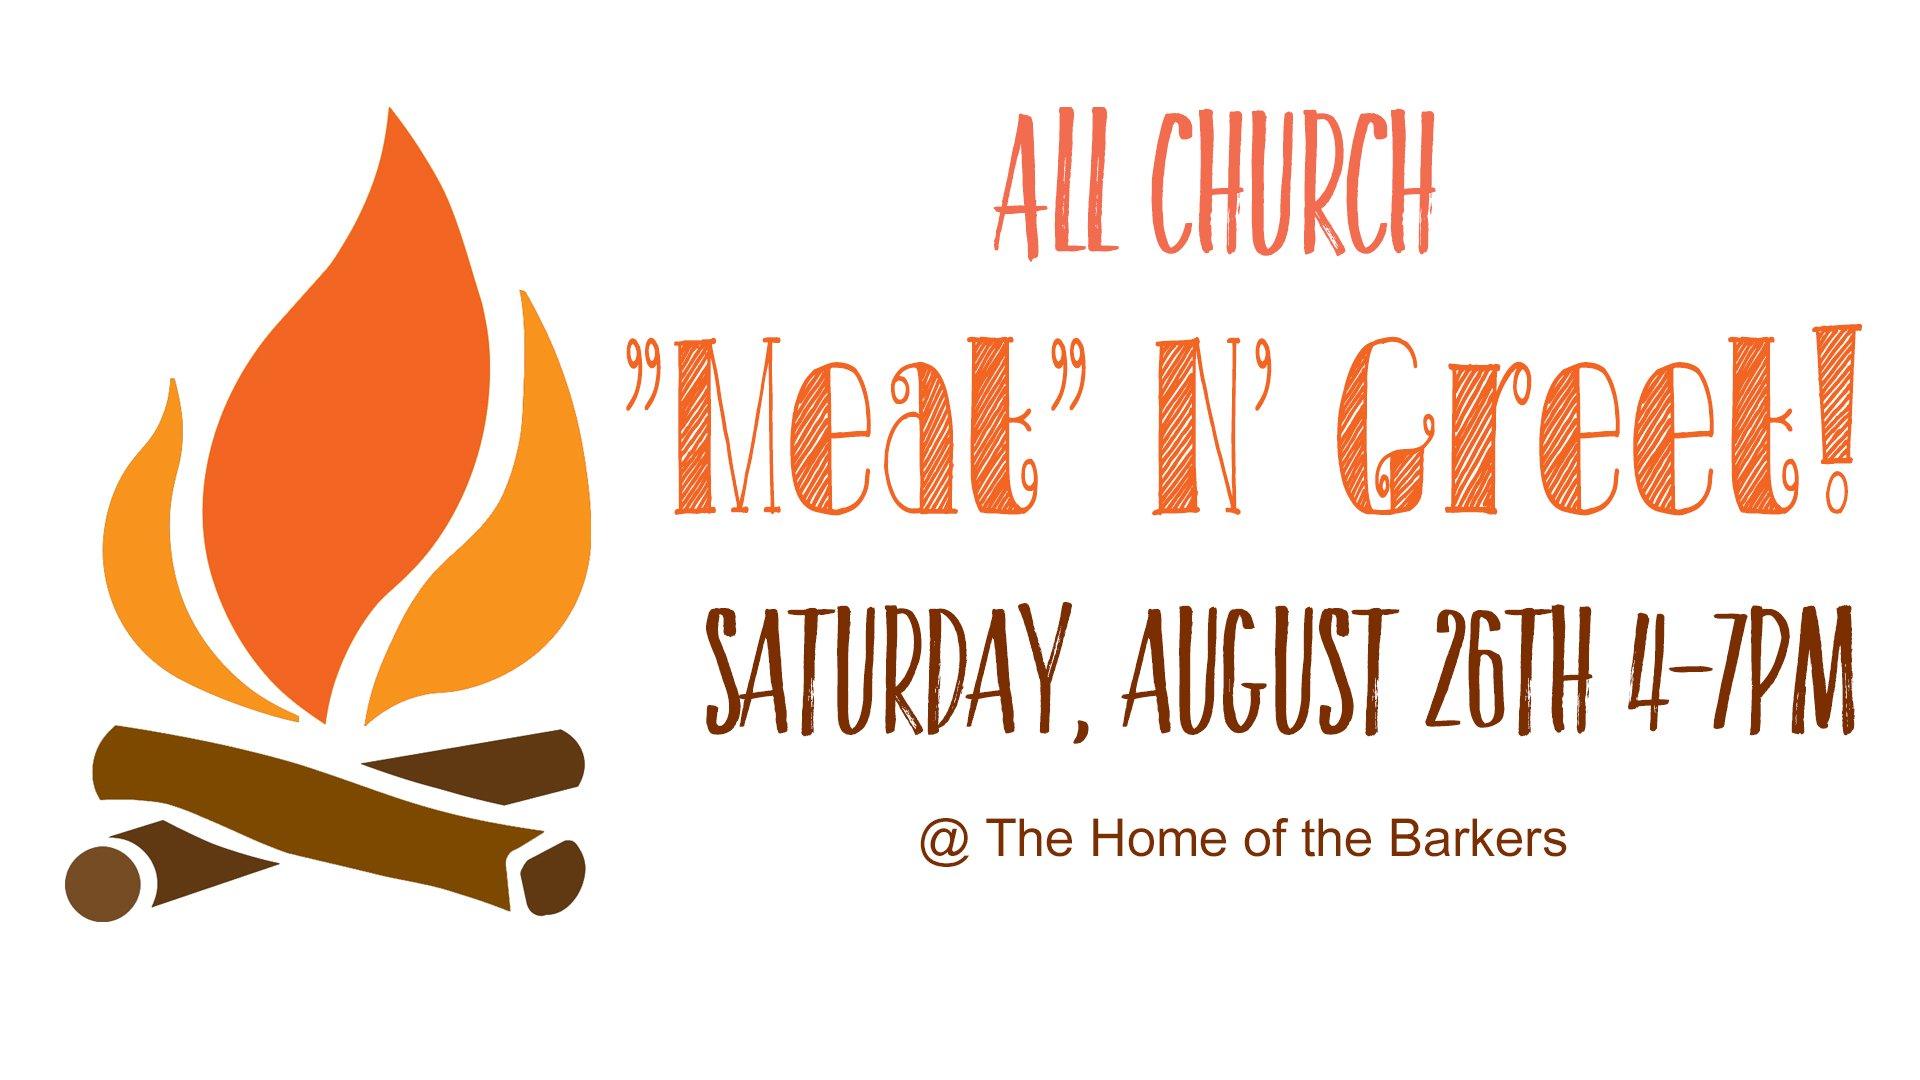 Meat N Greet Harvest Christian Church